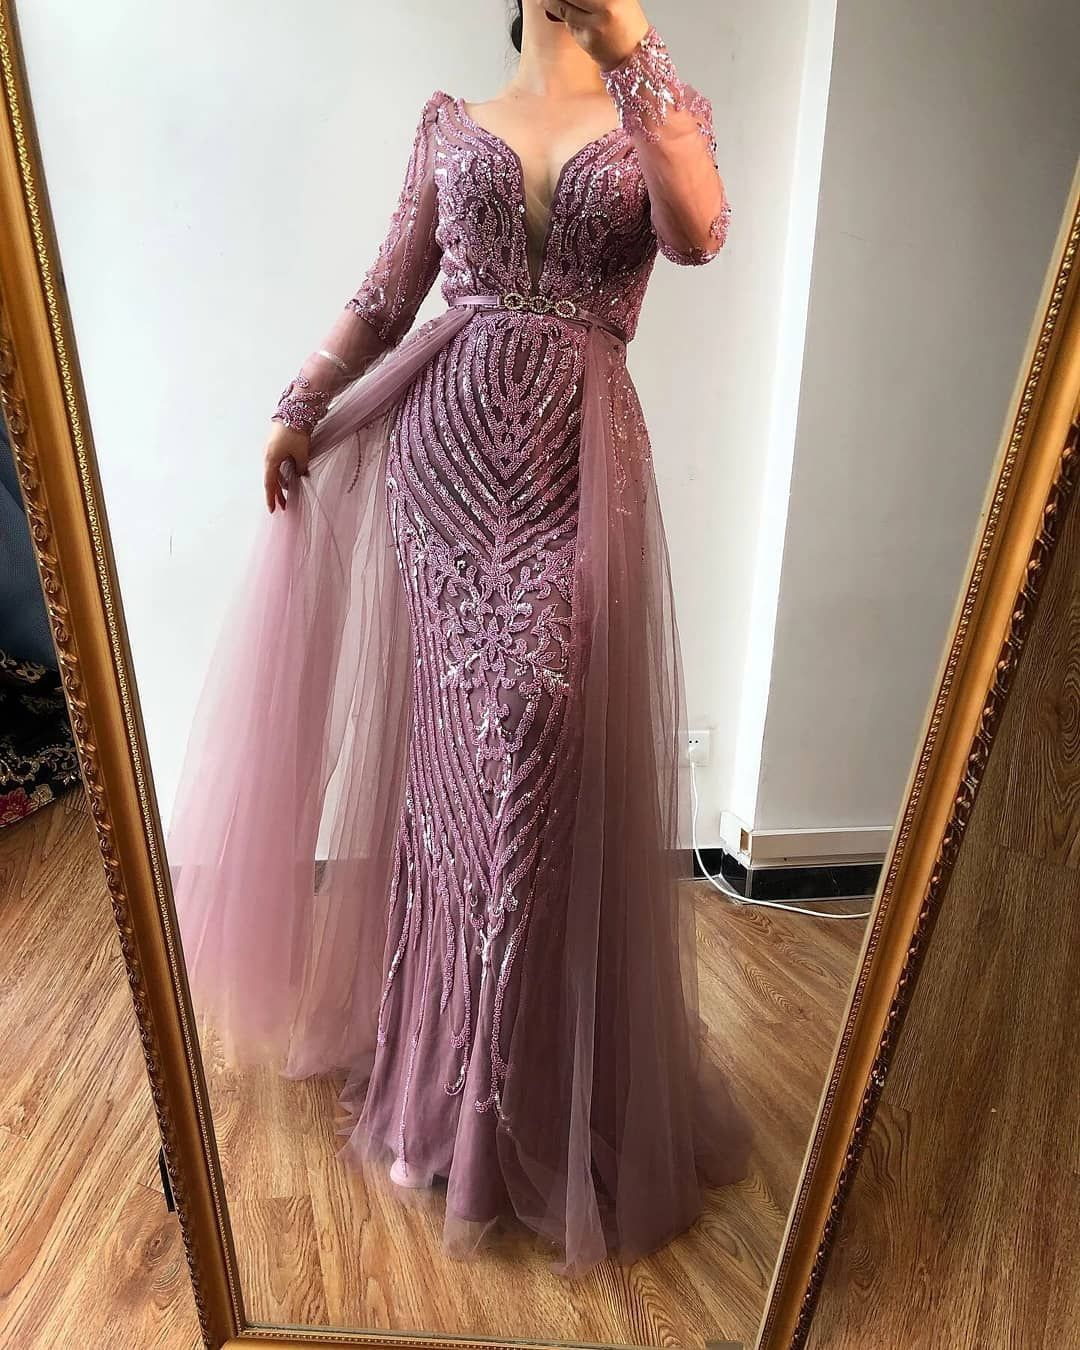 kleid #crown #bridetobe #hijabi #silber #gold # #bremen #hamburg